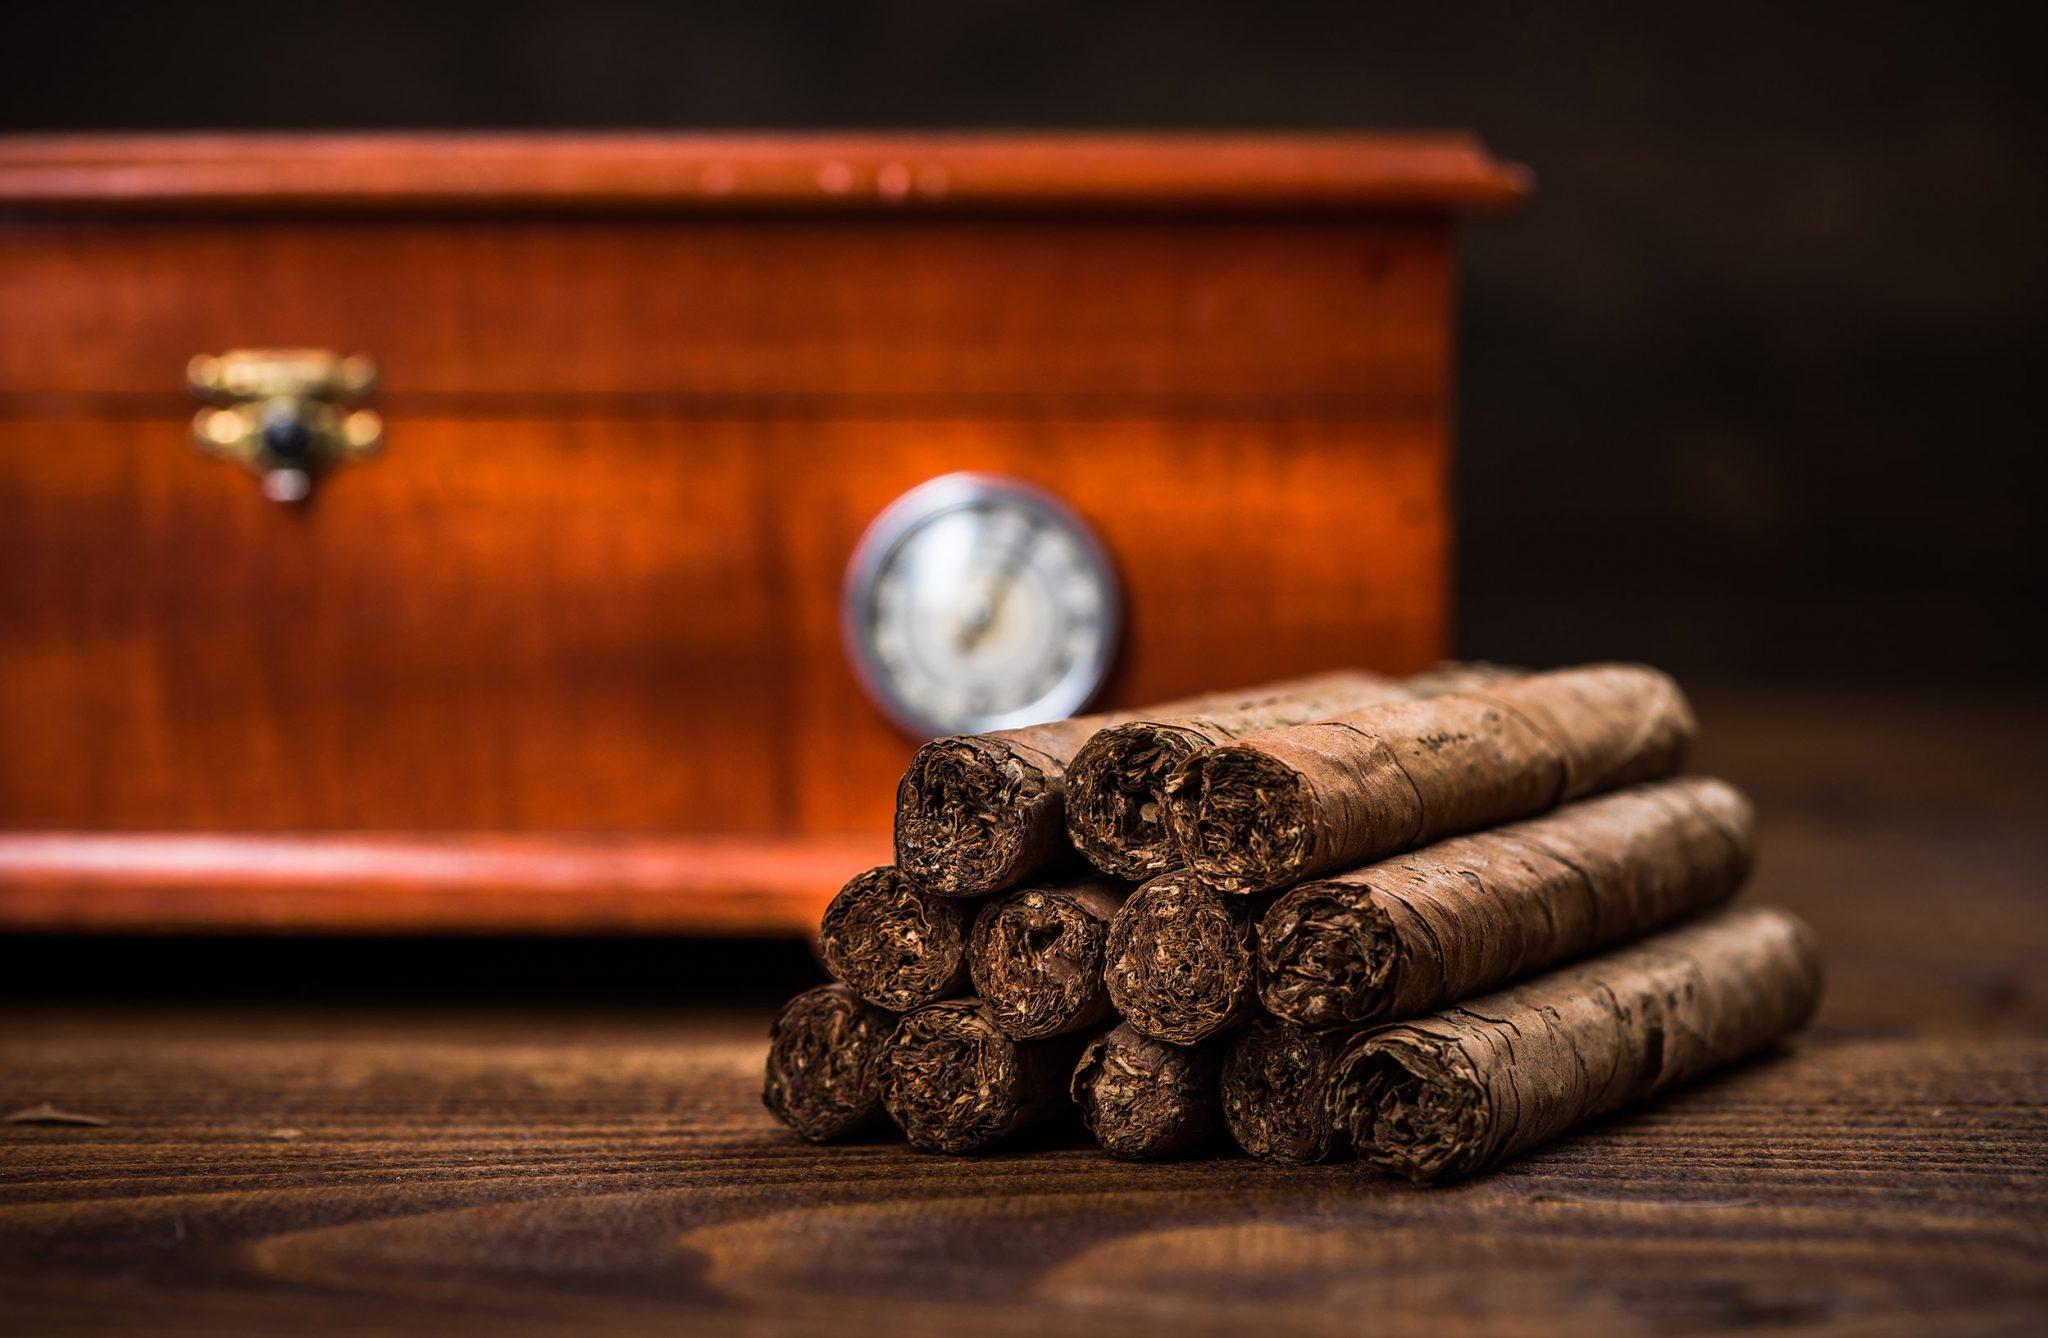 Cigar Awards for 2020